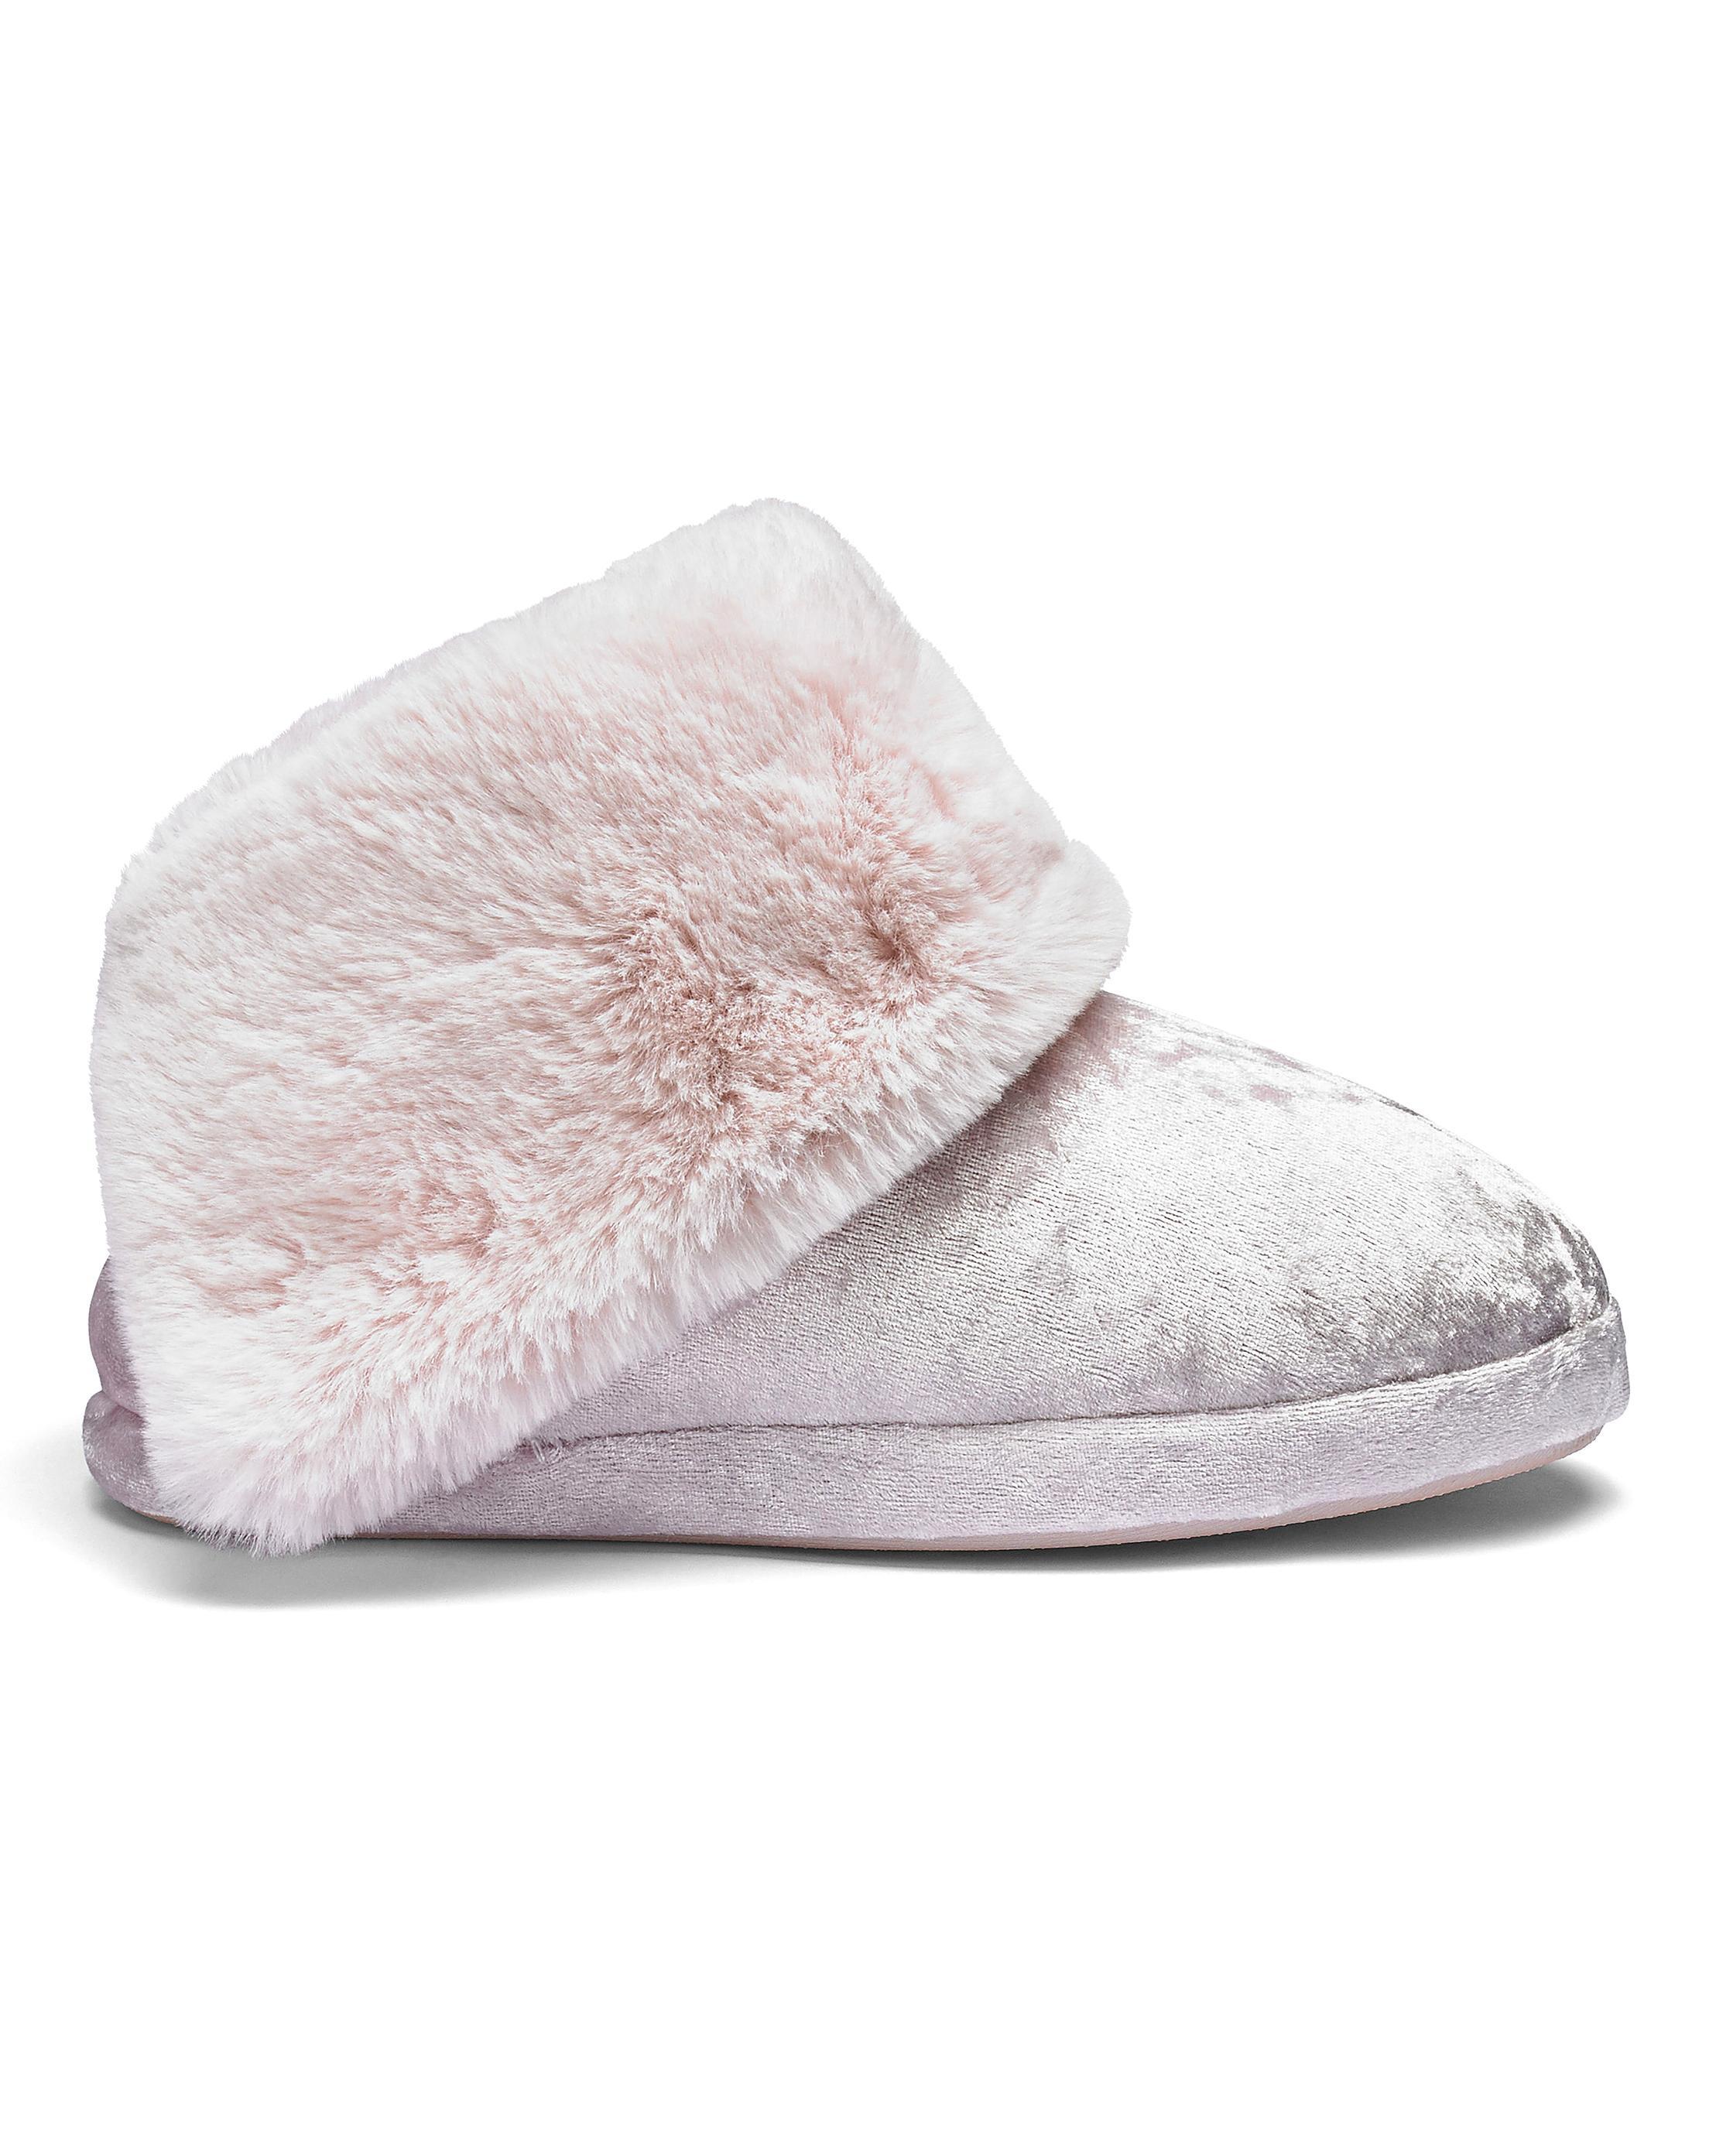 Heavenly Soles Slipper Boots discount for cheap N1vf7EiH